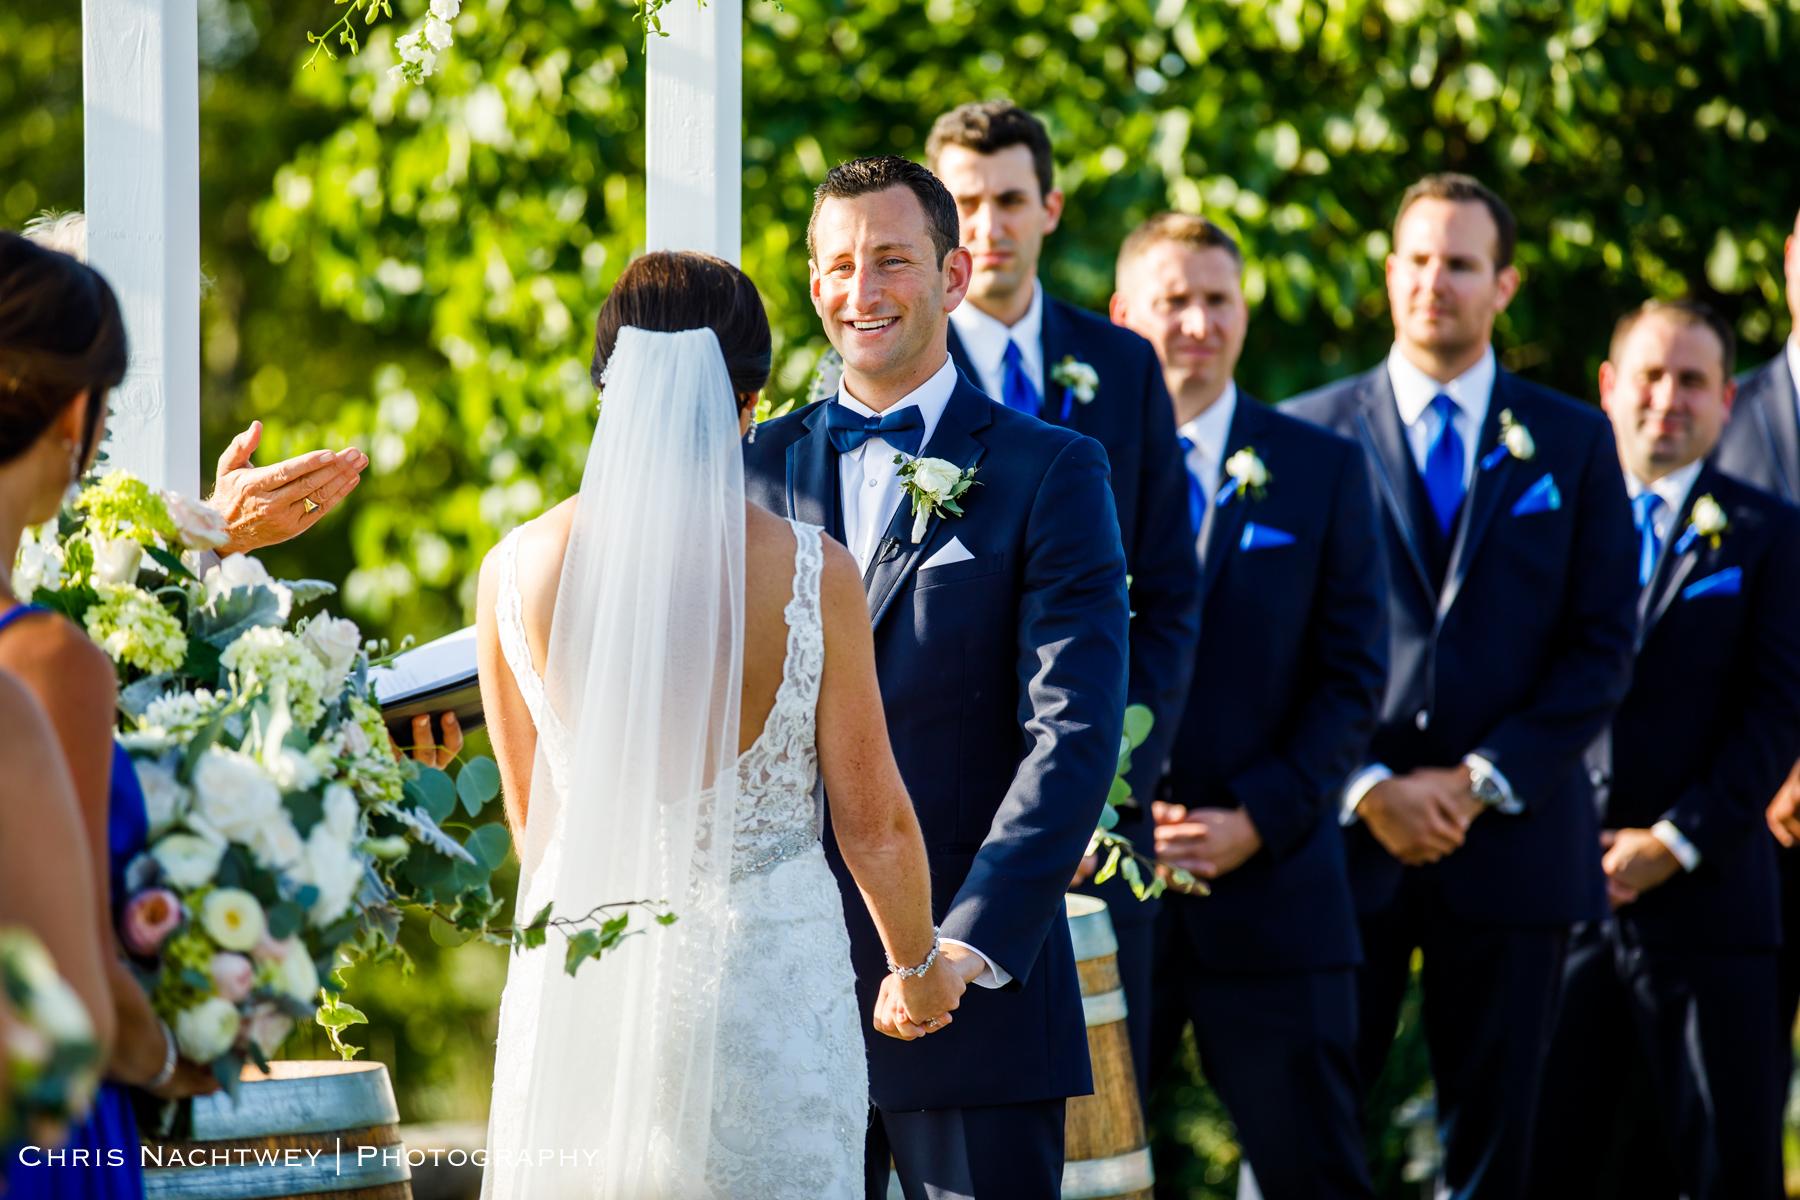 wedding-lake-of-isles-photos-chris-nachtwey-photography-2019-32.jpg